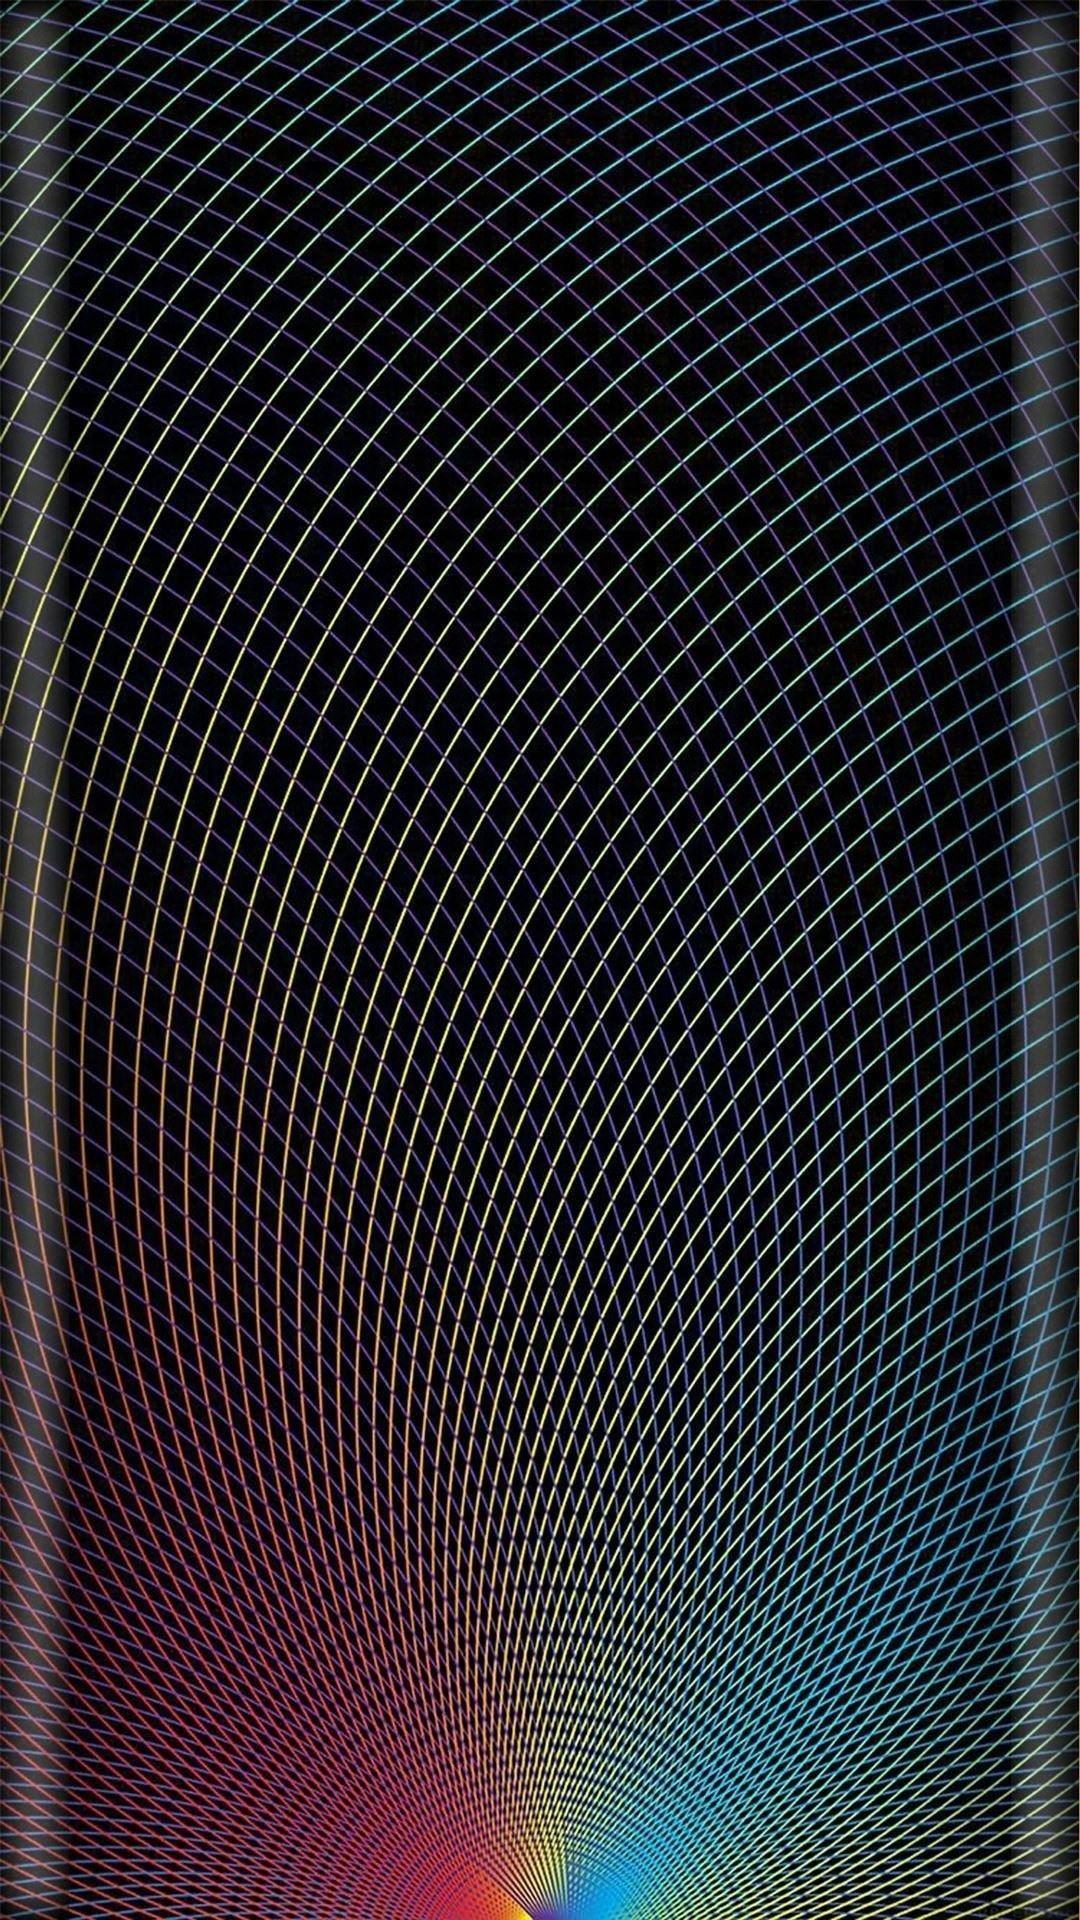 Wallpapers Fondos De Pantalla Abstractos Hd 4k Celular 3d 1080p Pinterest 6 Fondos De Pantalla Abstractos Fondo De Pantalla De Samsung Motorola Fondos De Pantalla